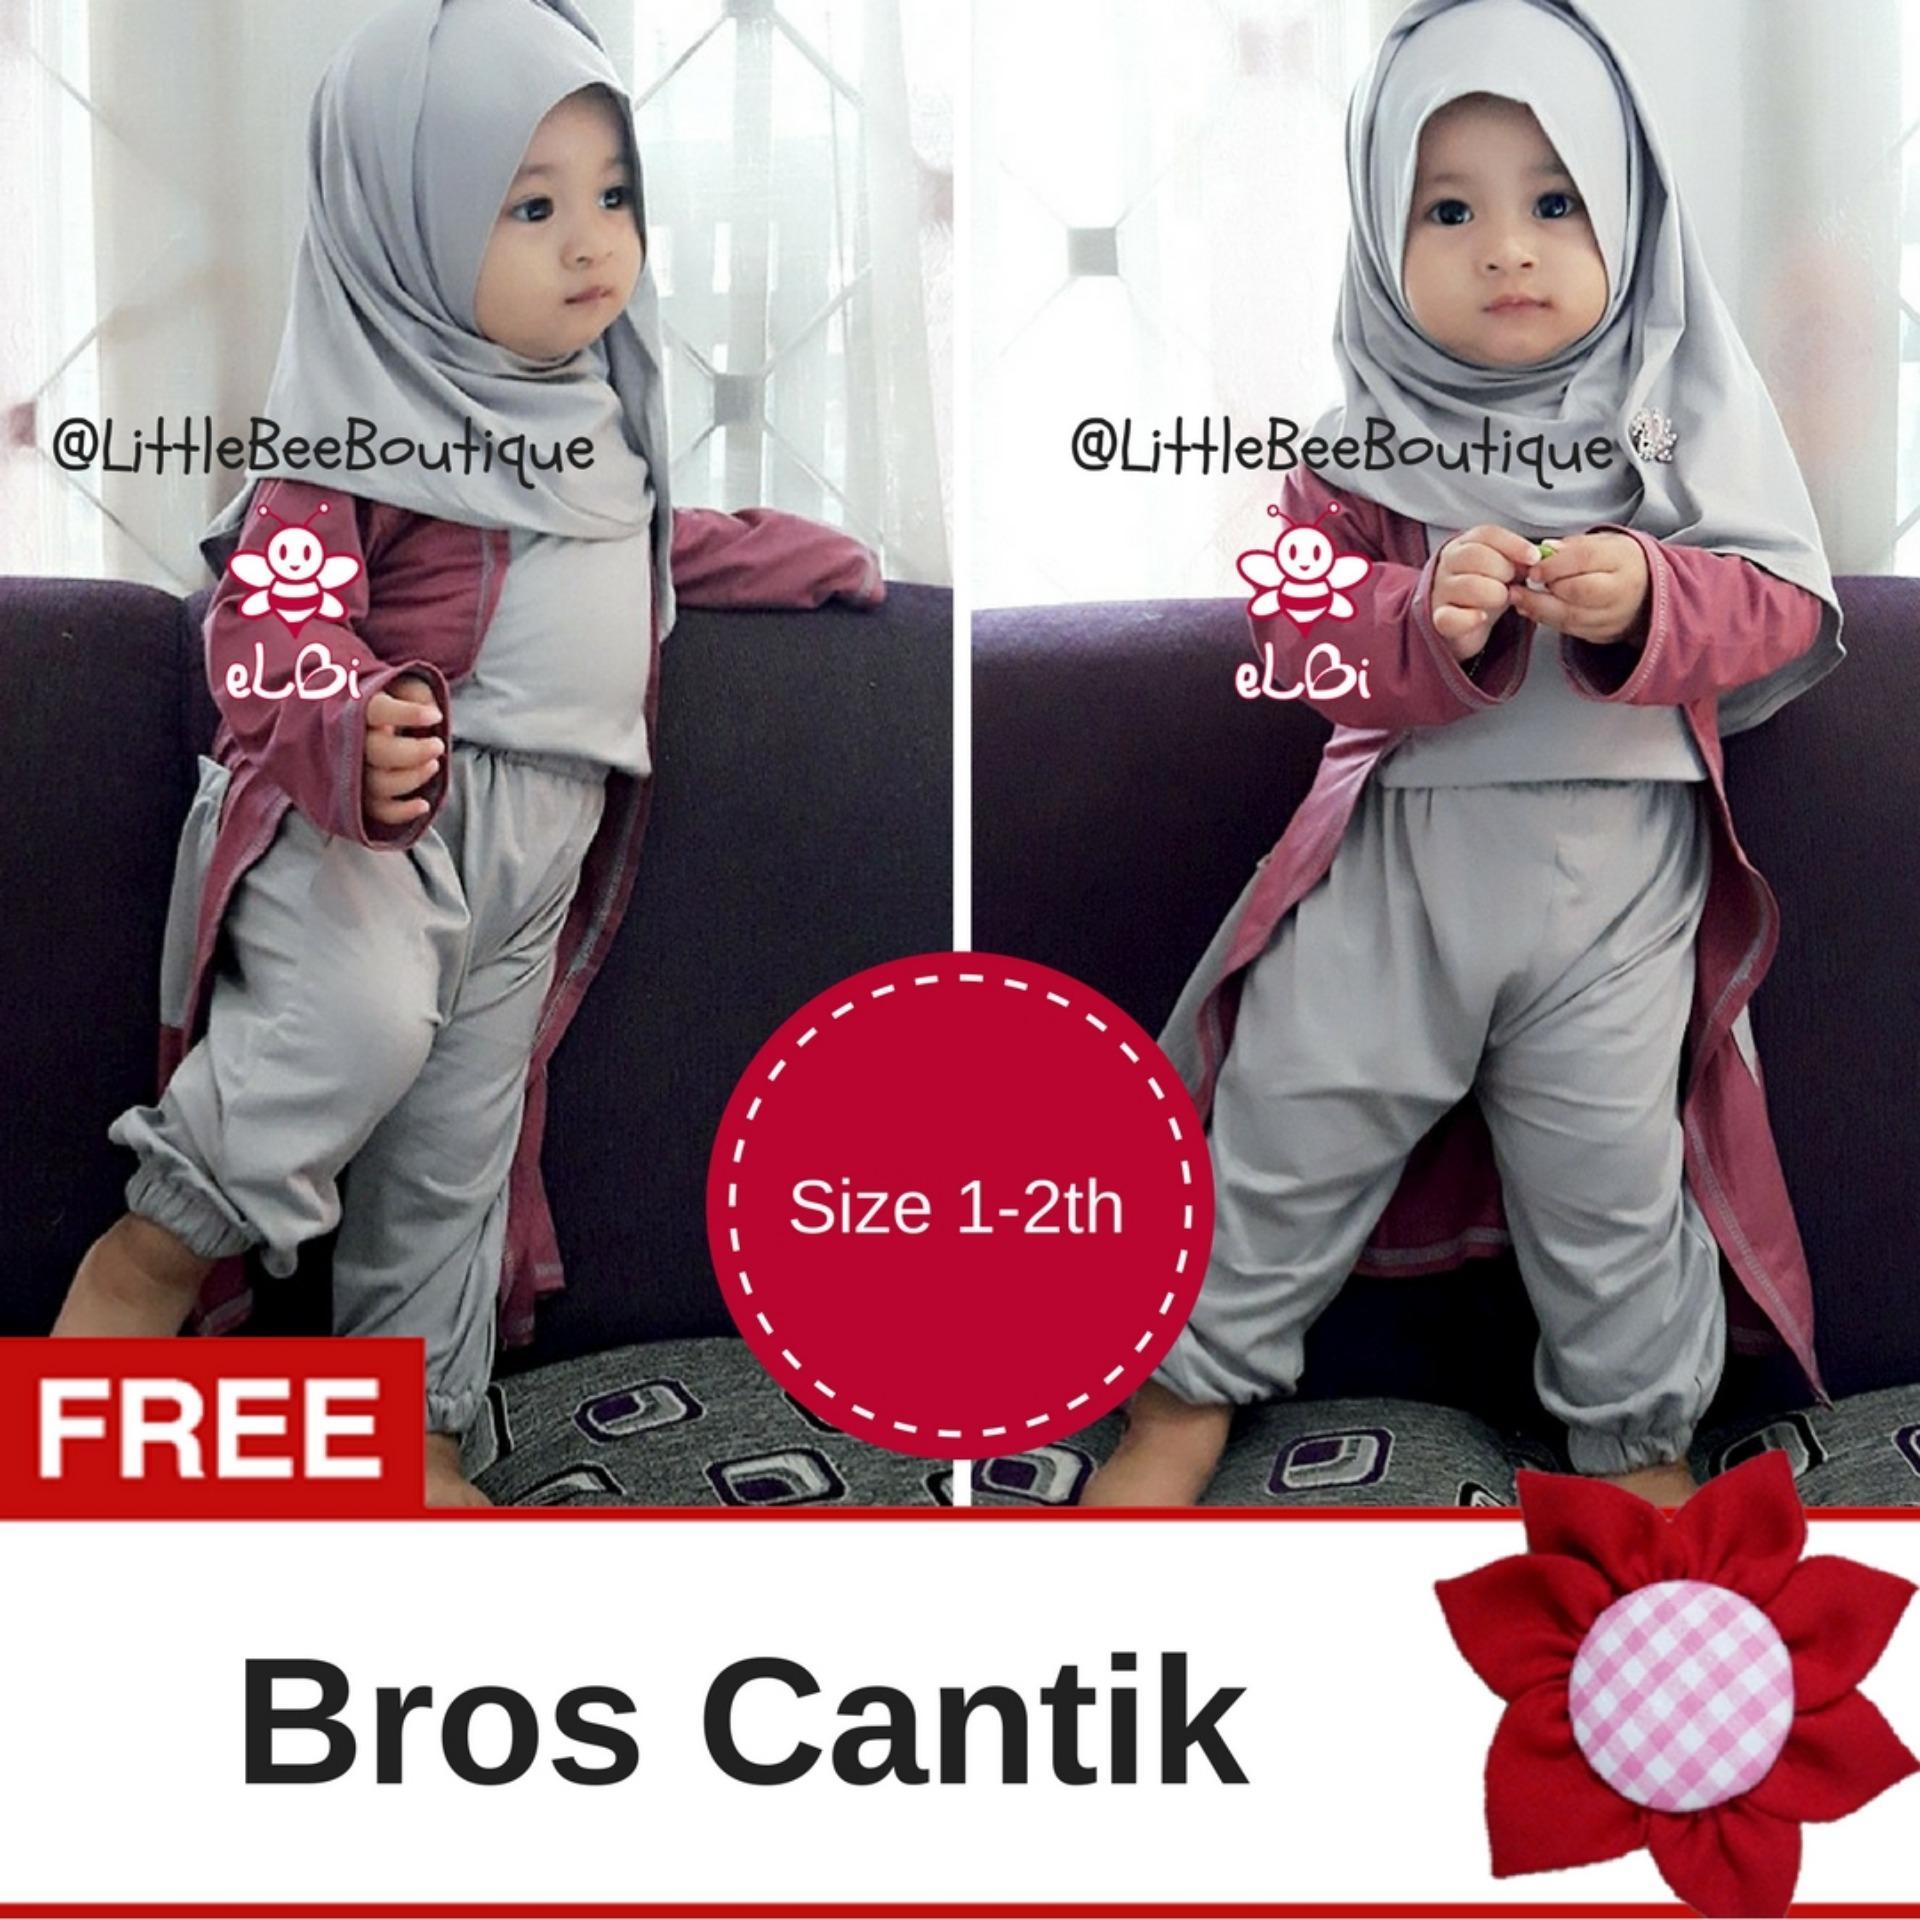 eLBi - Gisela Set Baju Muslim Anak Balita / Baju Anak Bayi Perempuan / Baju Anak 1 Tahun hingga 6 Tahun by Little Bee Boutique